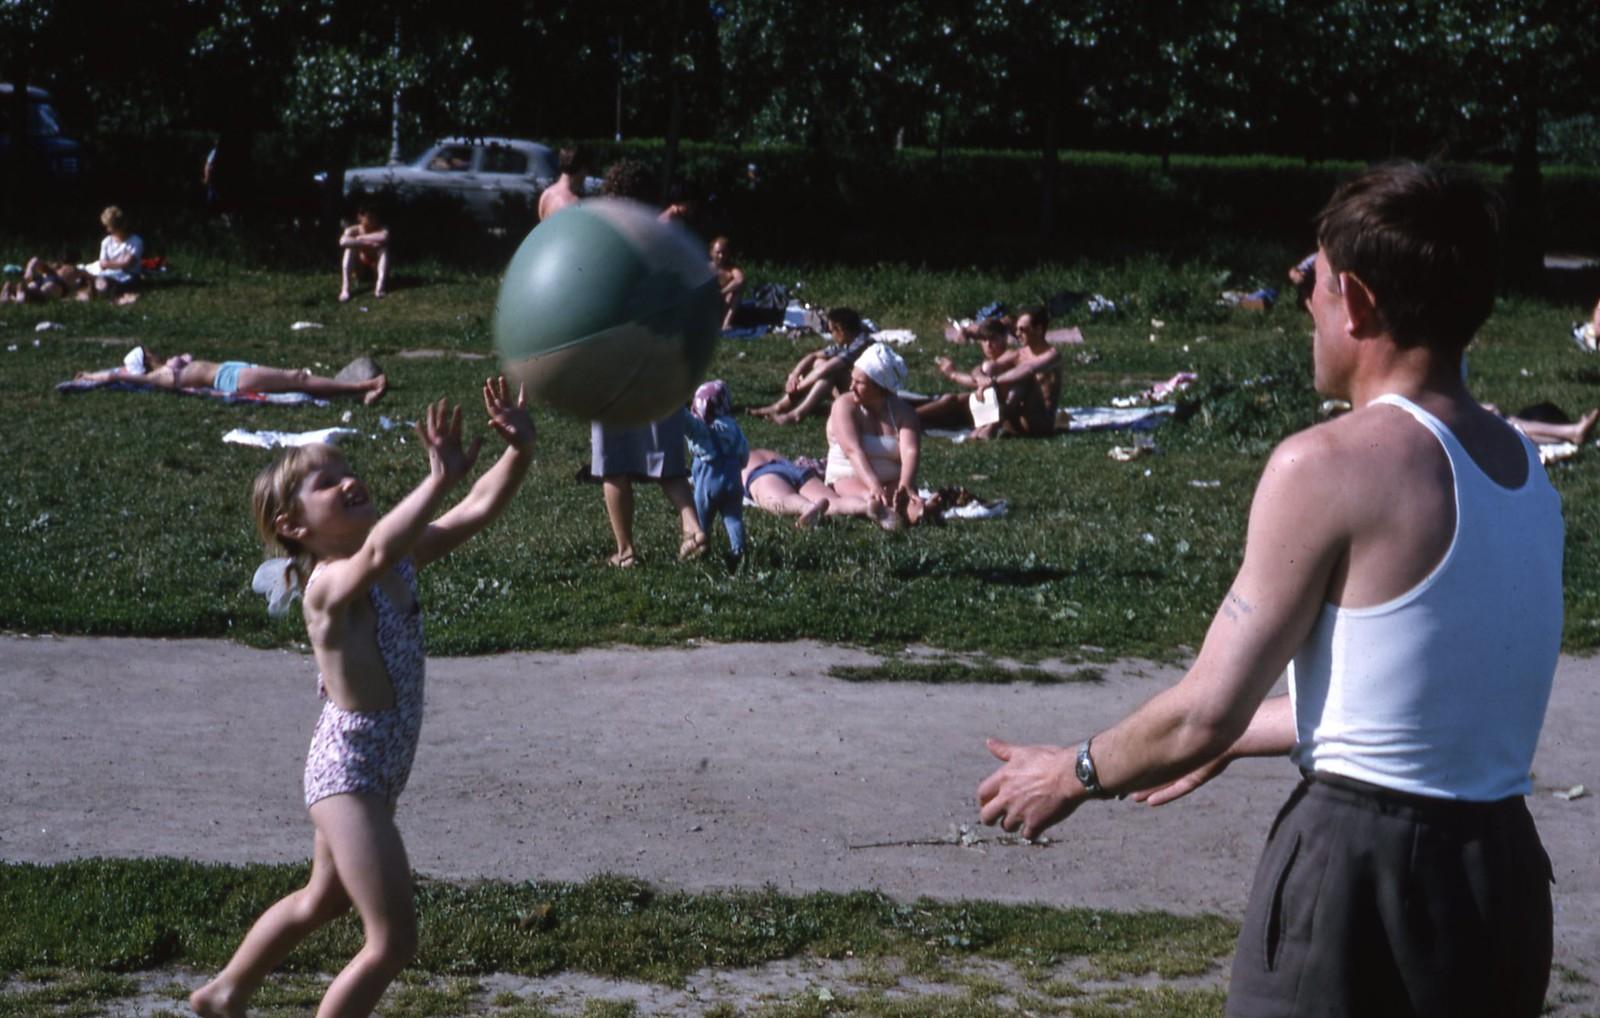 hammond-MA10-Ostankino-people-sunbathing-and-fishing-004